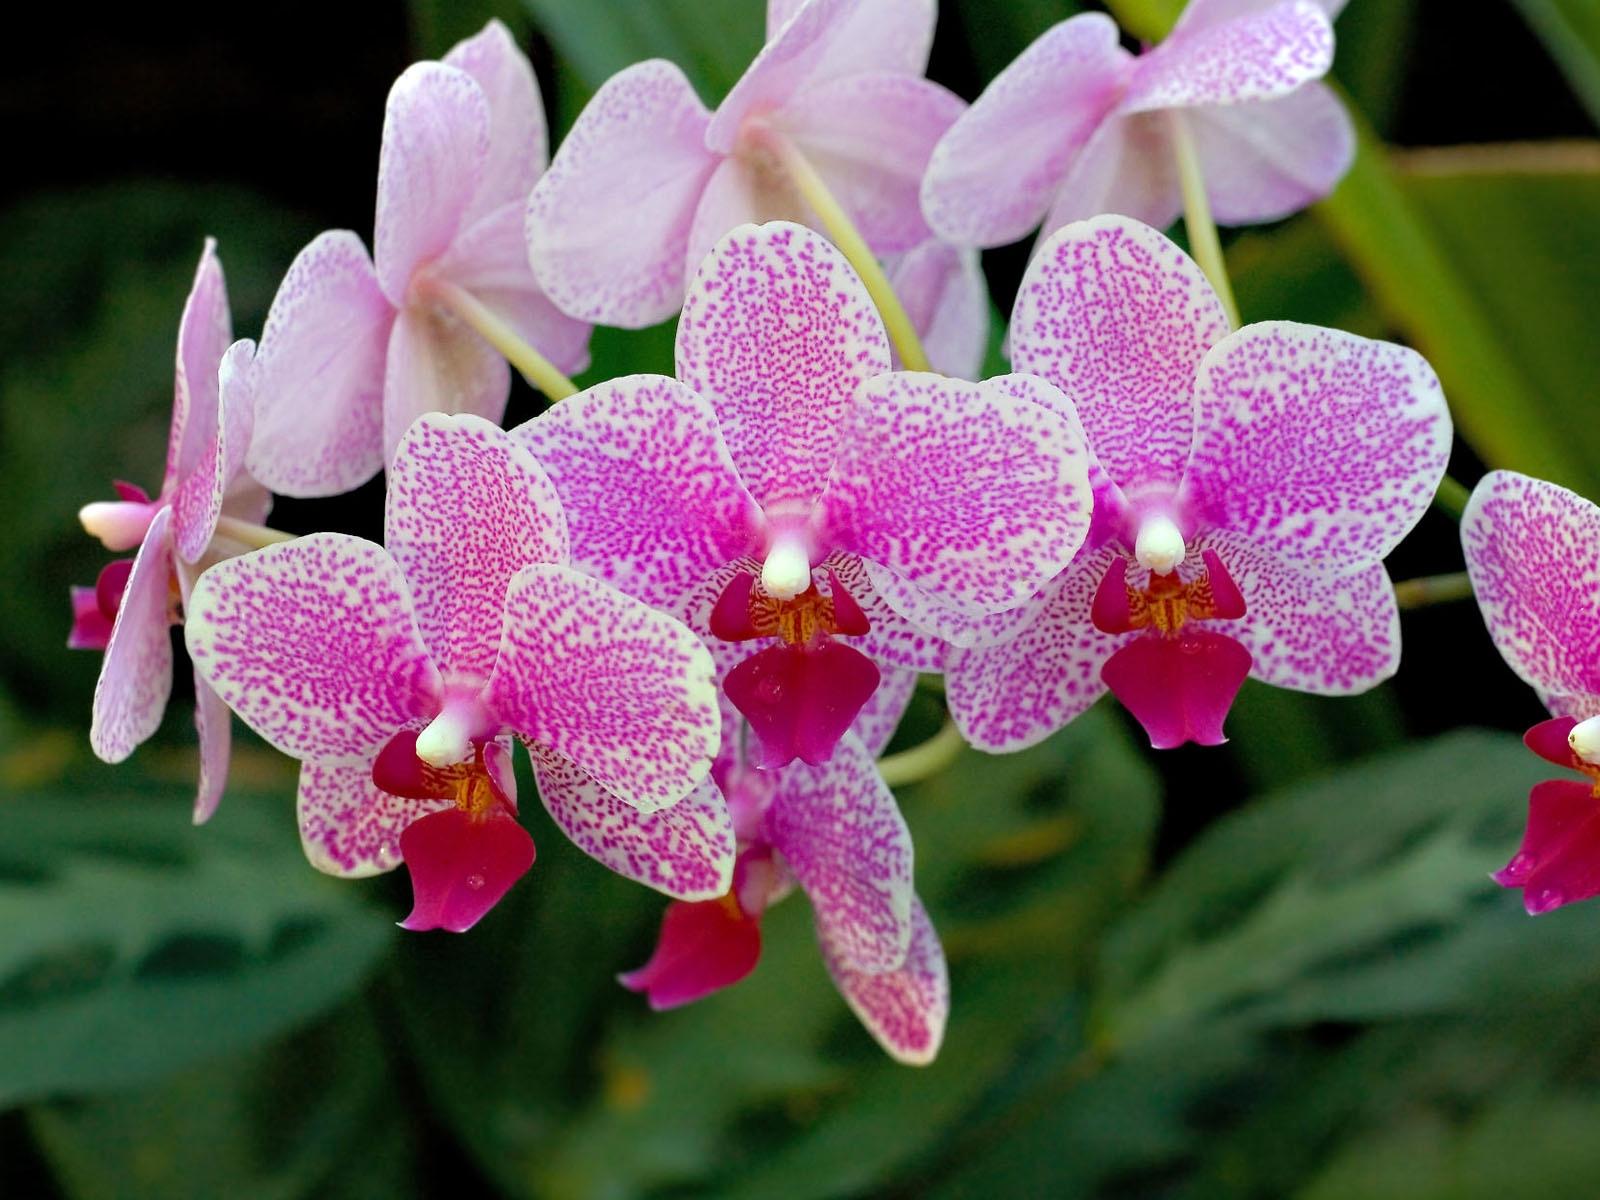 Orchid Flower Images beautiful flowers Prettiest Flowers